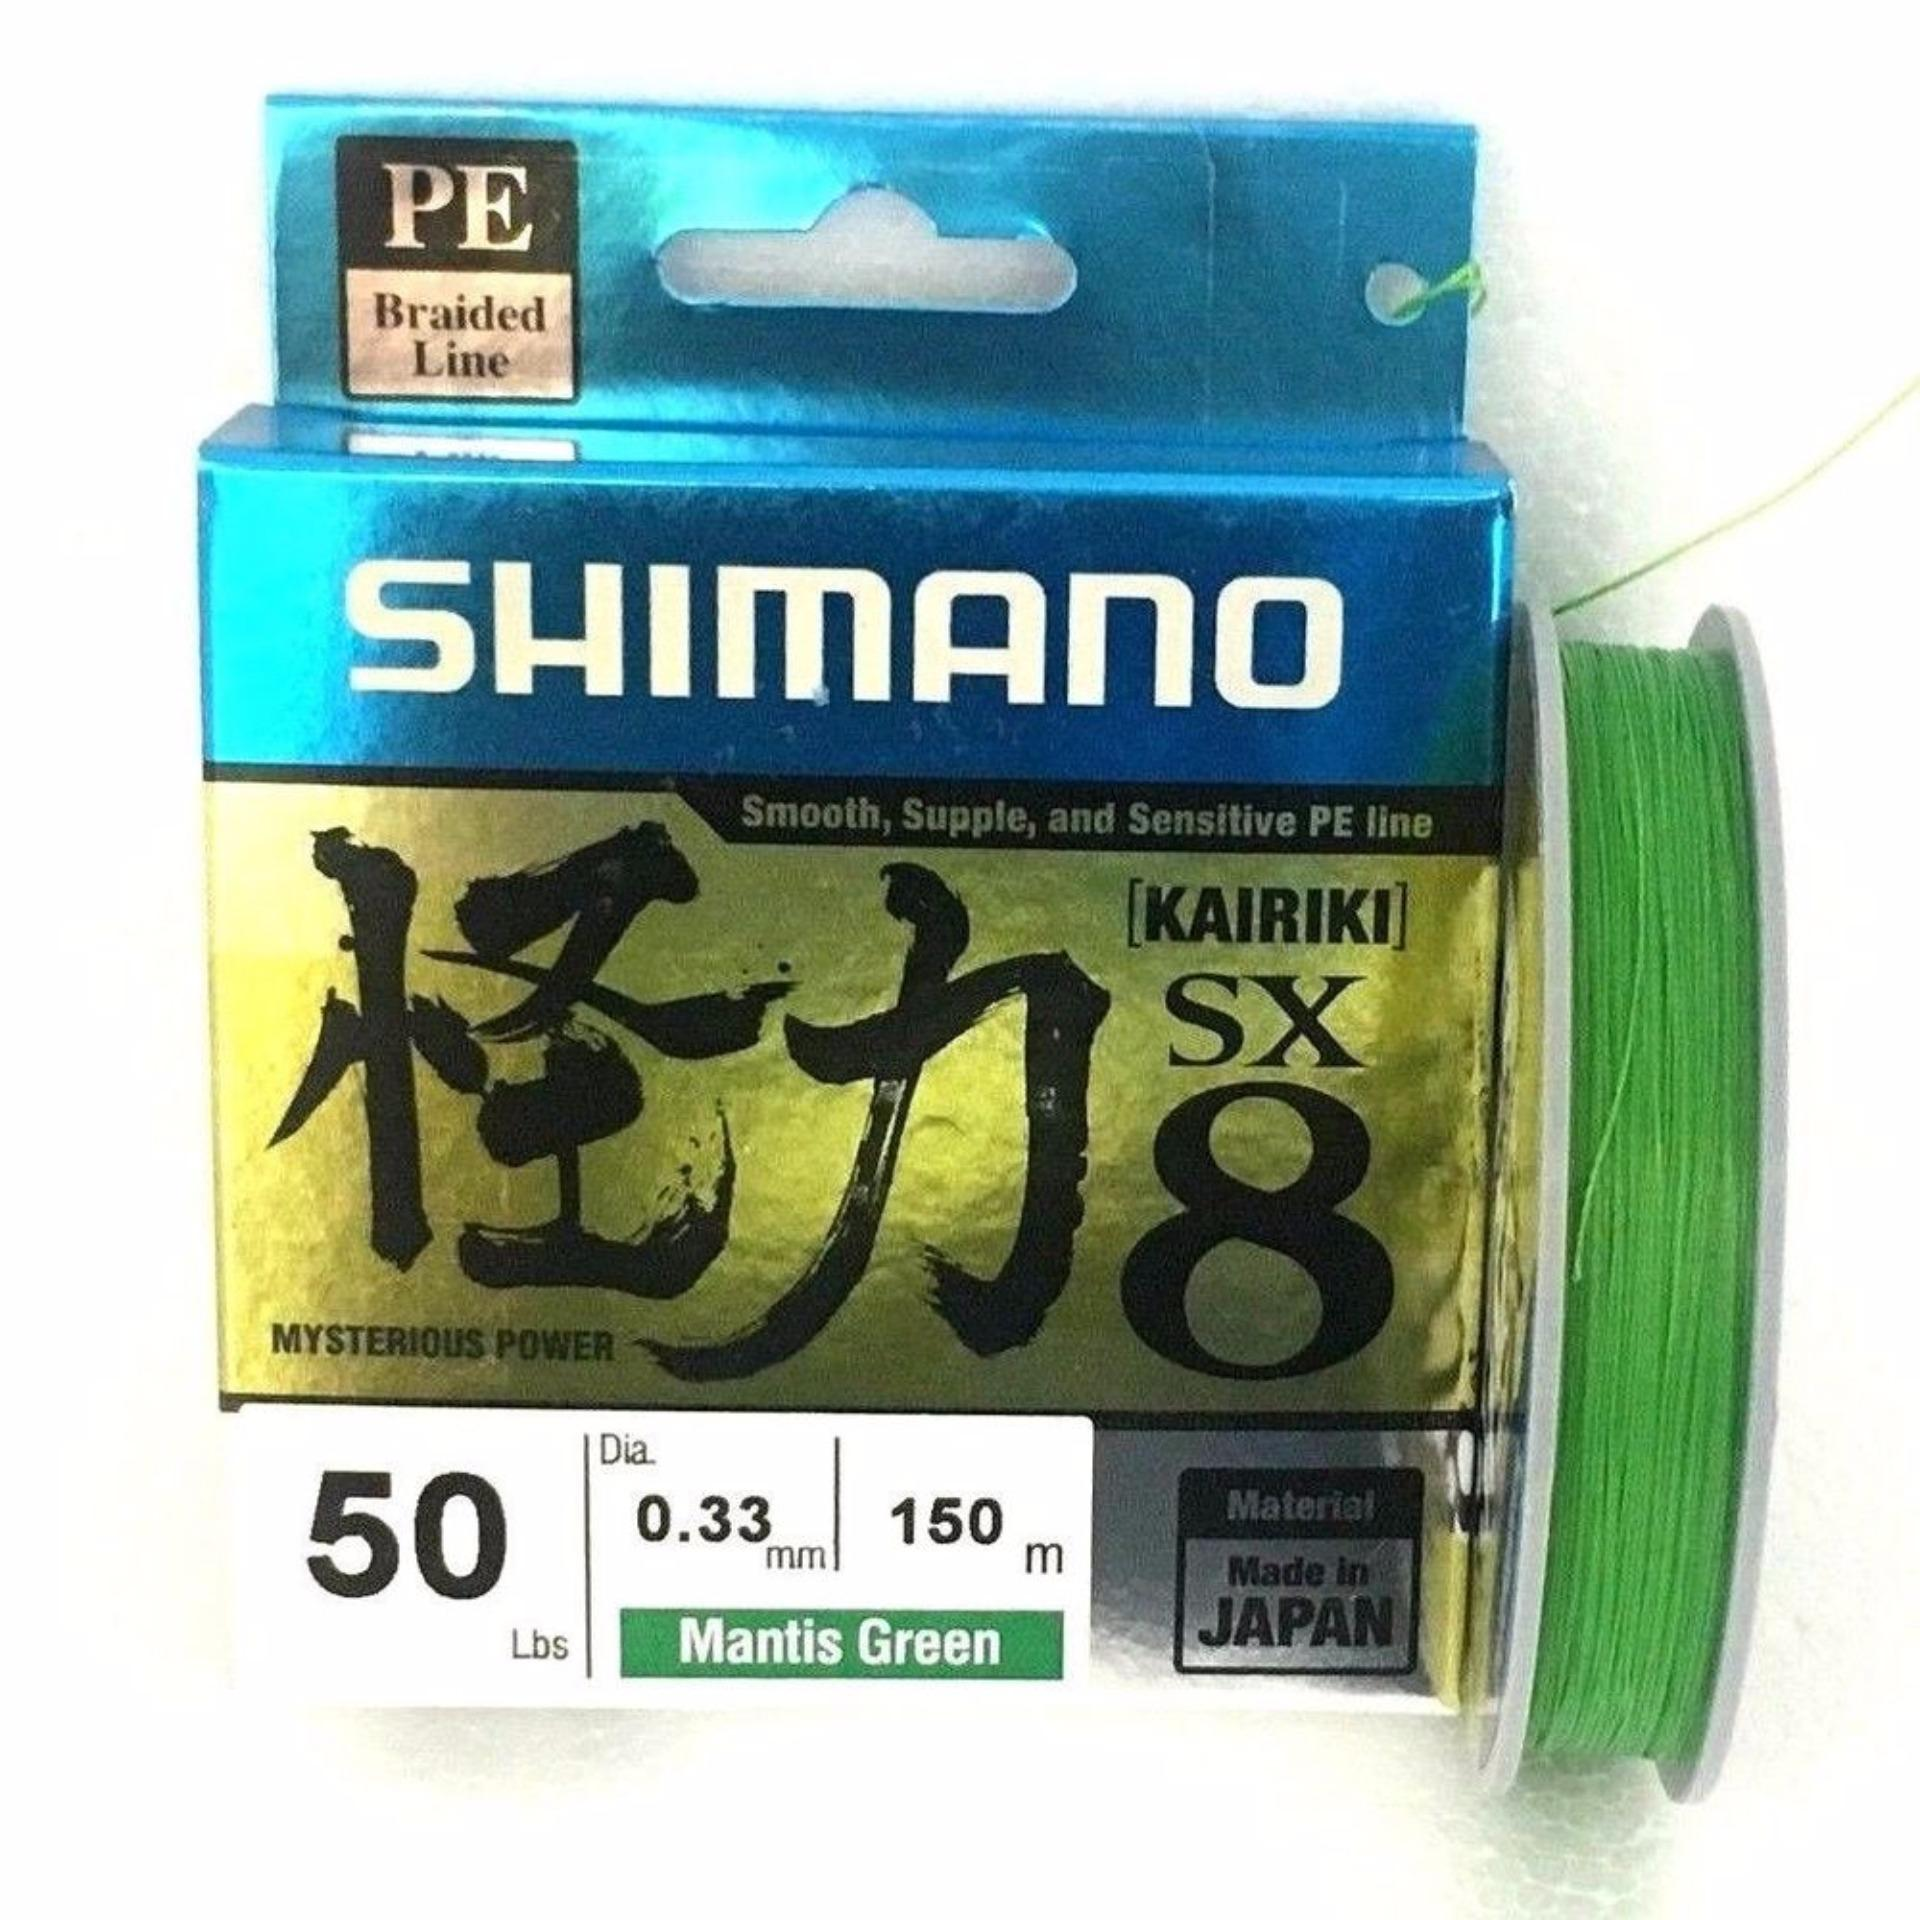 DÂY CÂU CÁ SHIMANO KAIRIKI SX8 – PE – 150m/50lbs